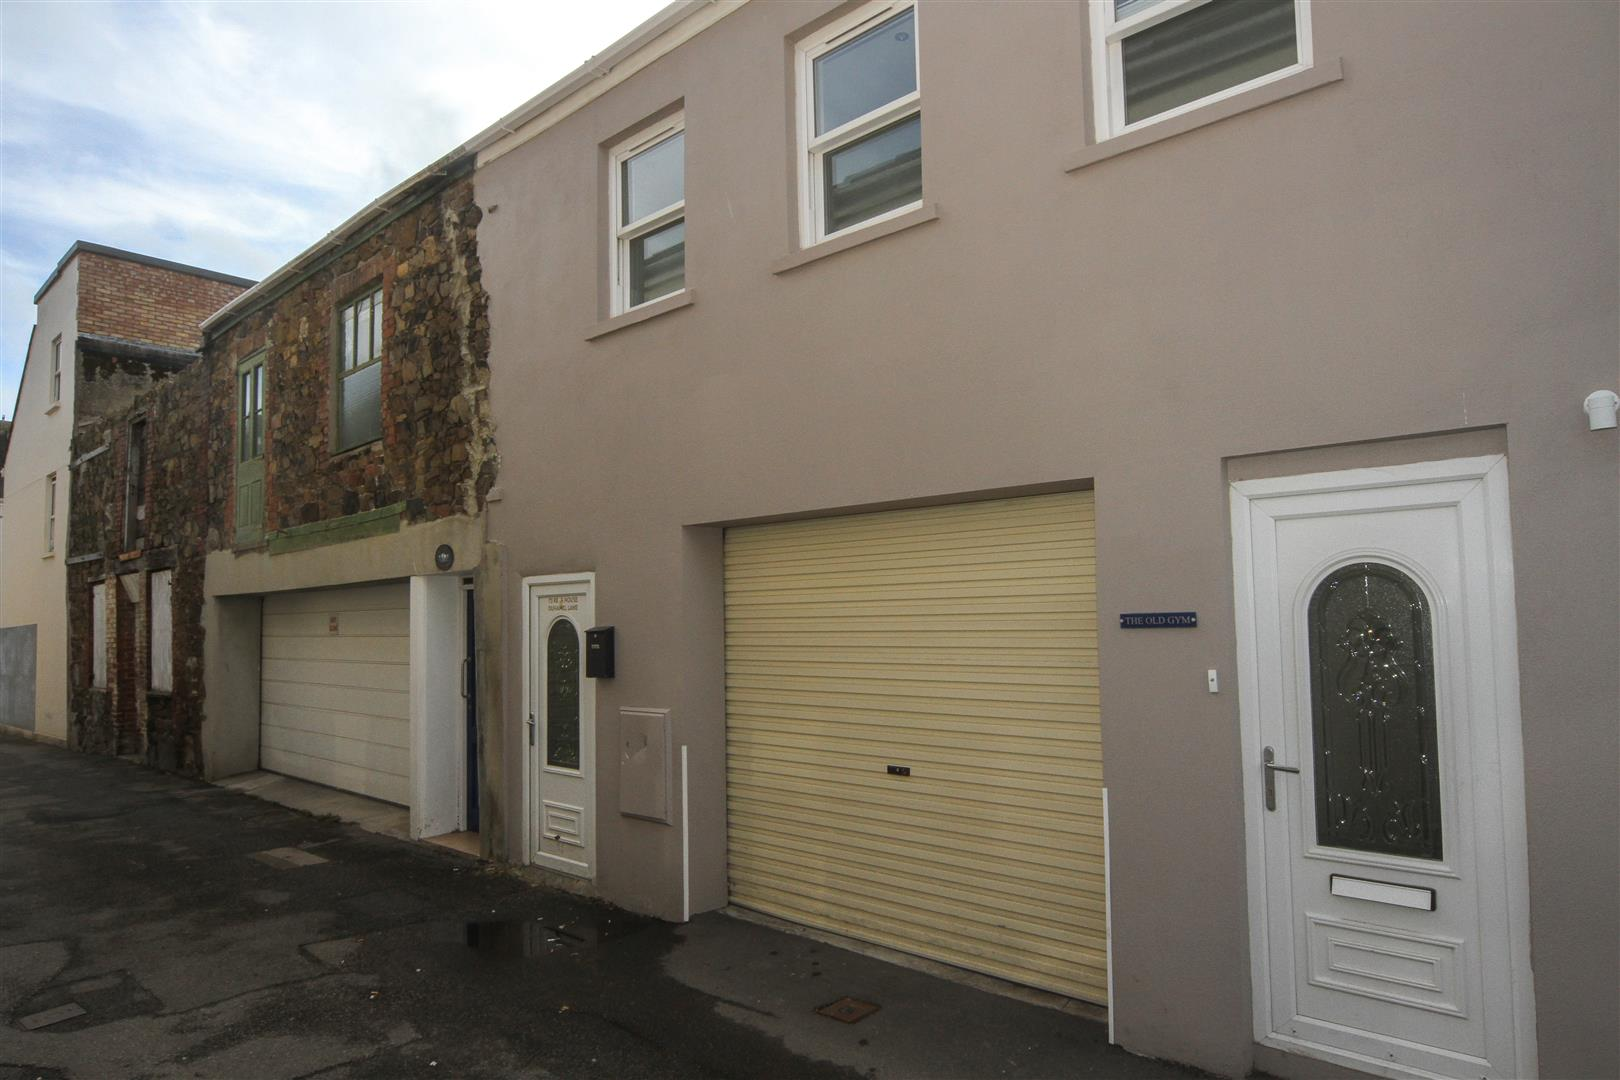 Duhamel Lane, St. Helier, Jersey